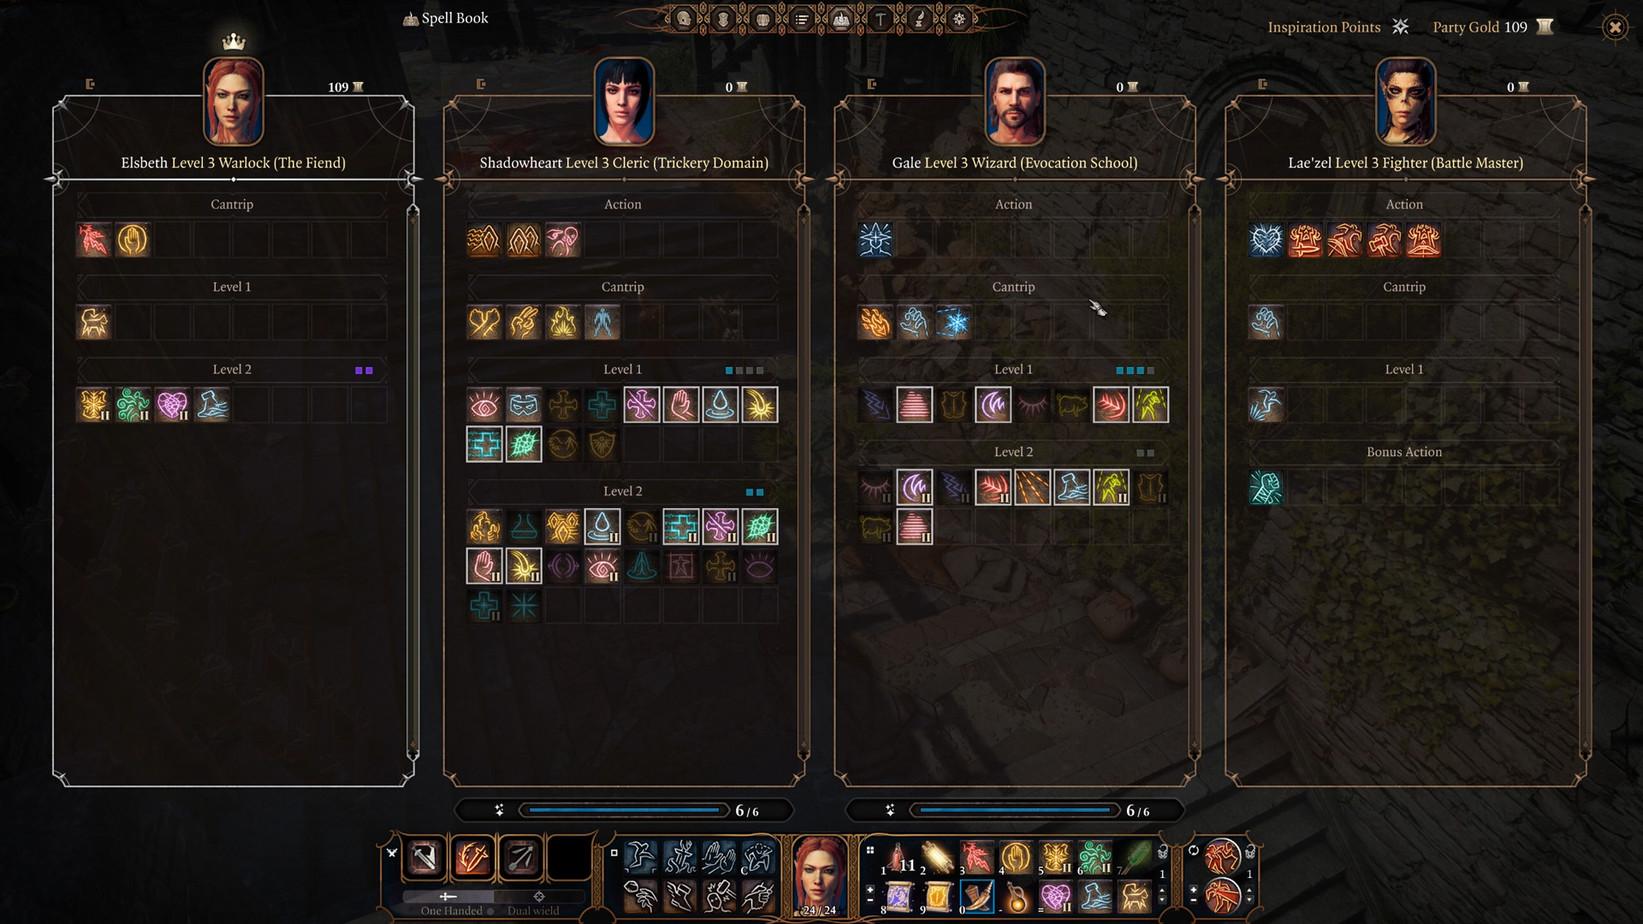 Baldur's Gate 3 macOS